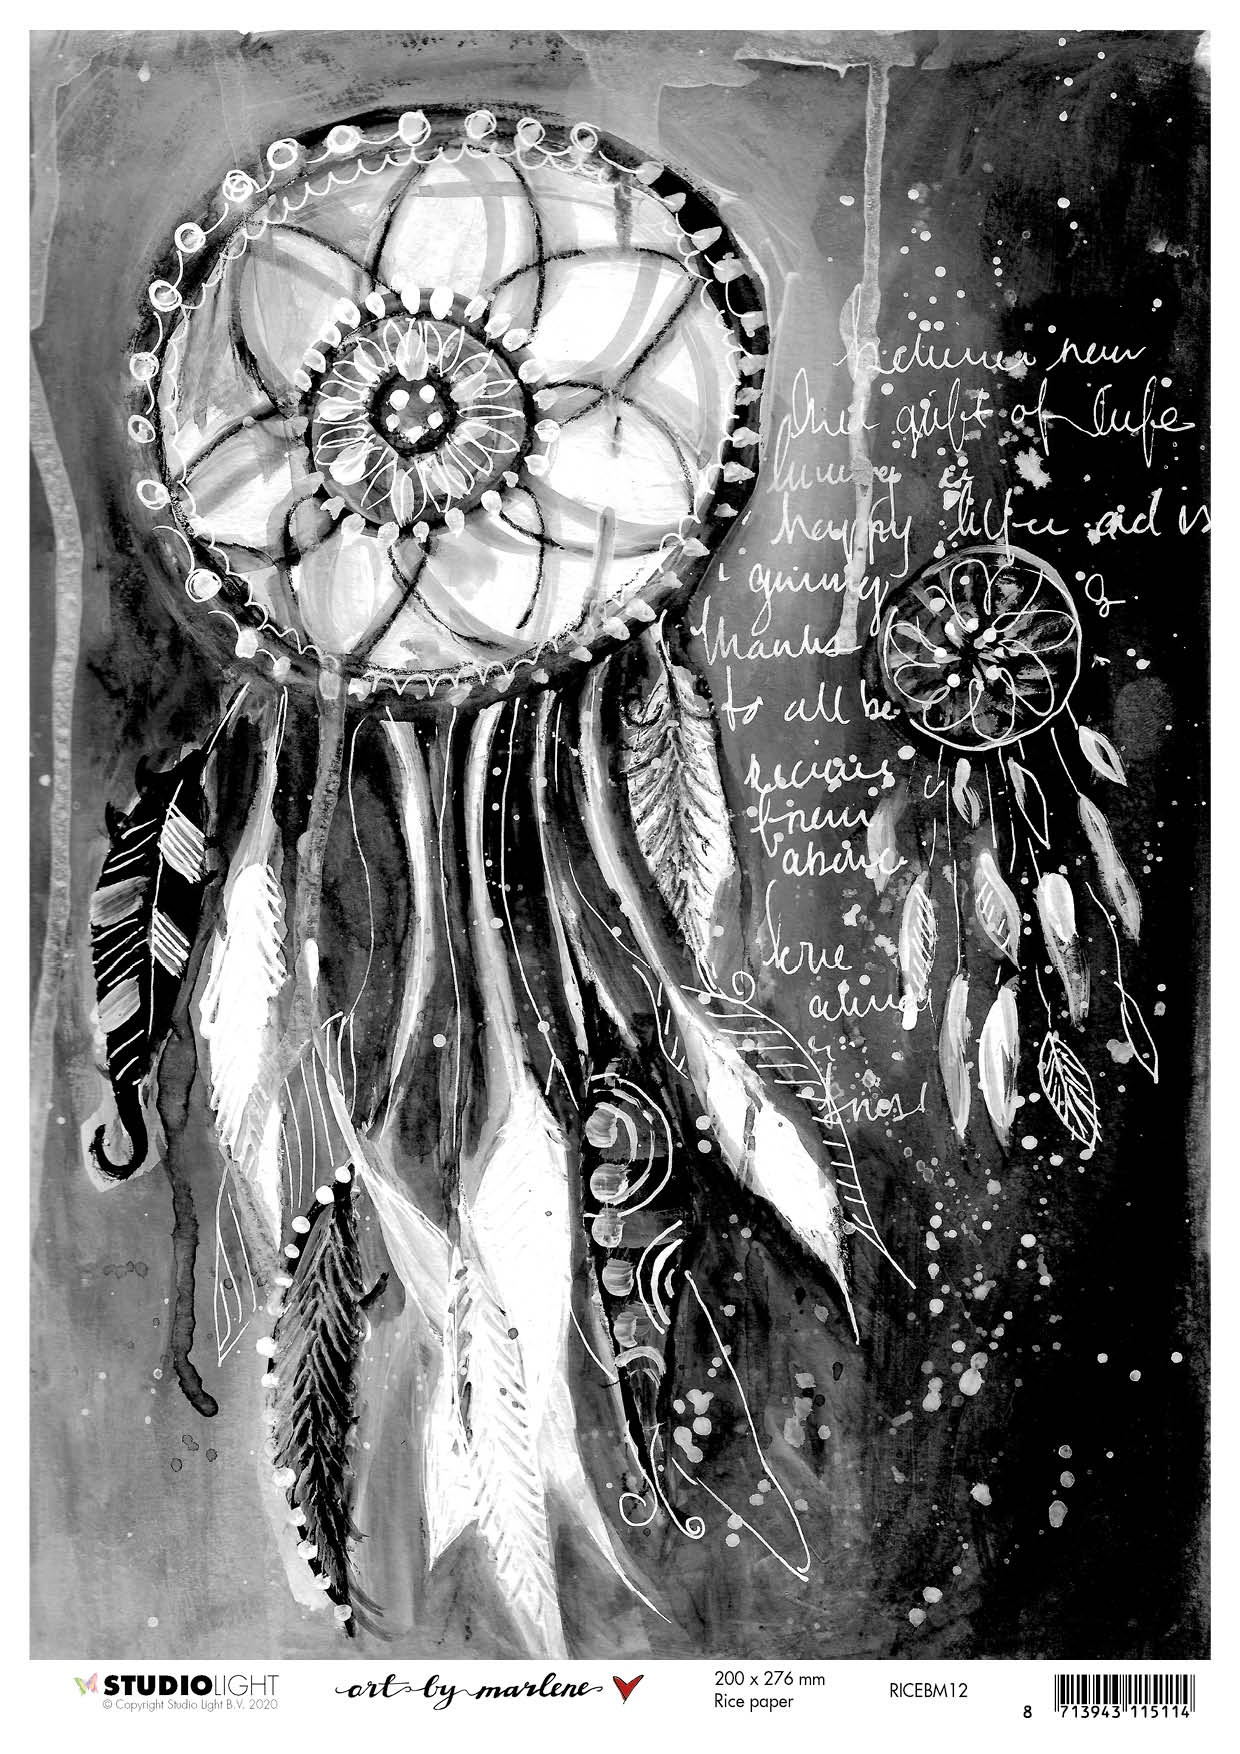 Art By Marlene - 5.0 Rice Paper Sheet A4 - NR. 12